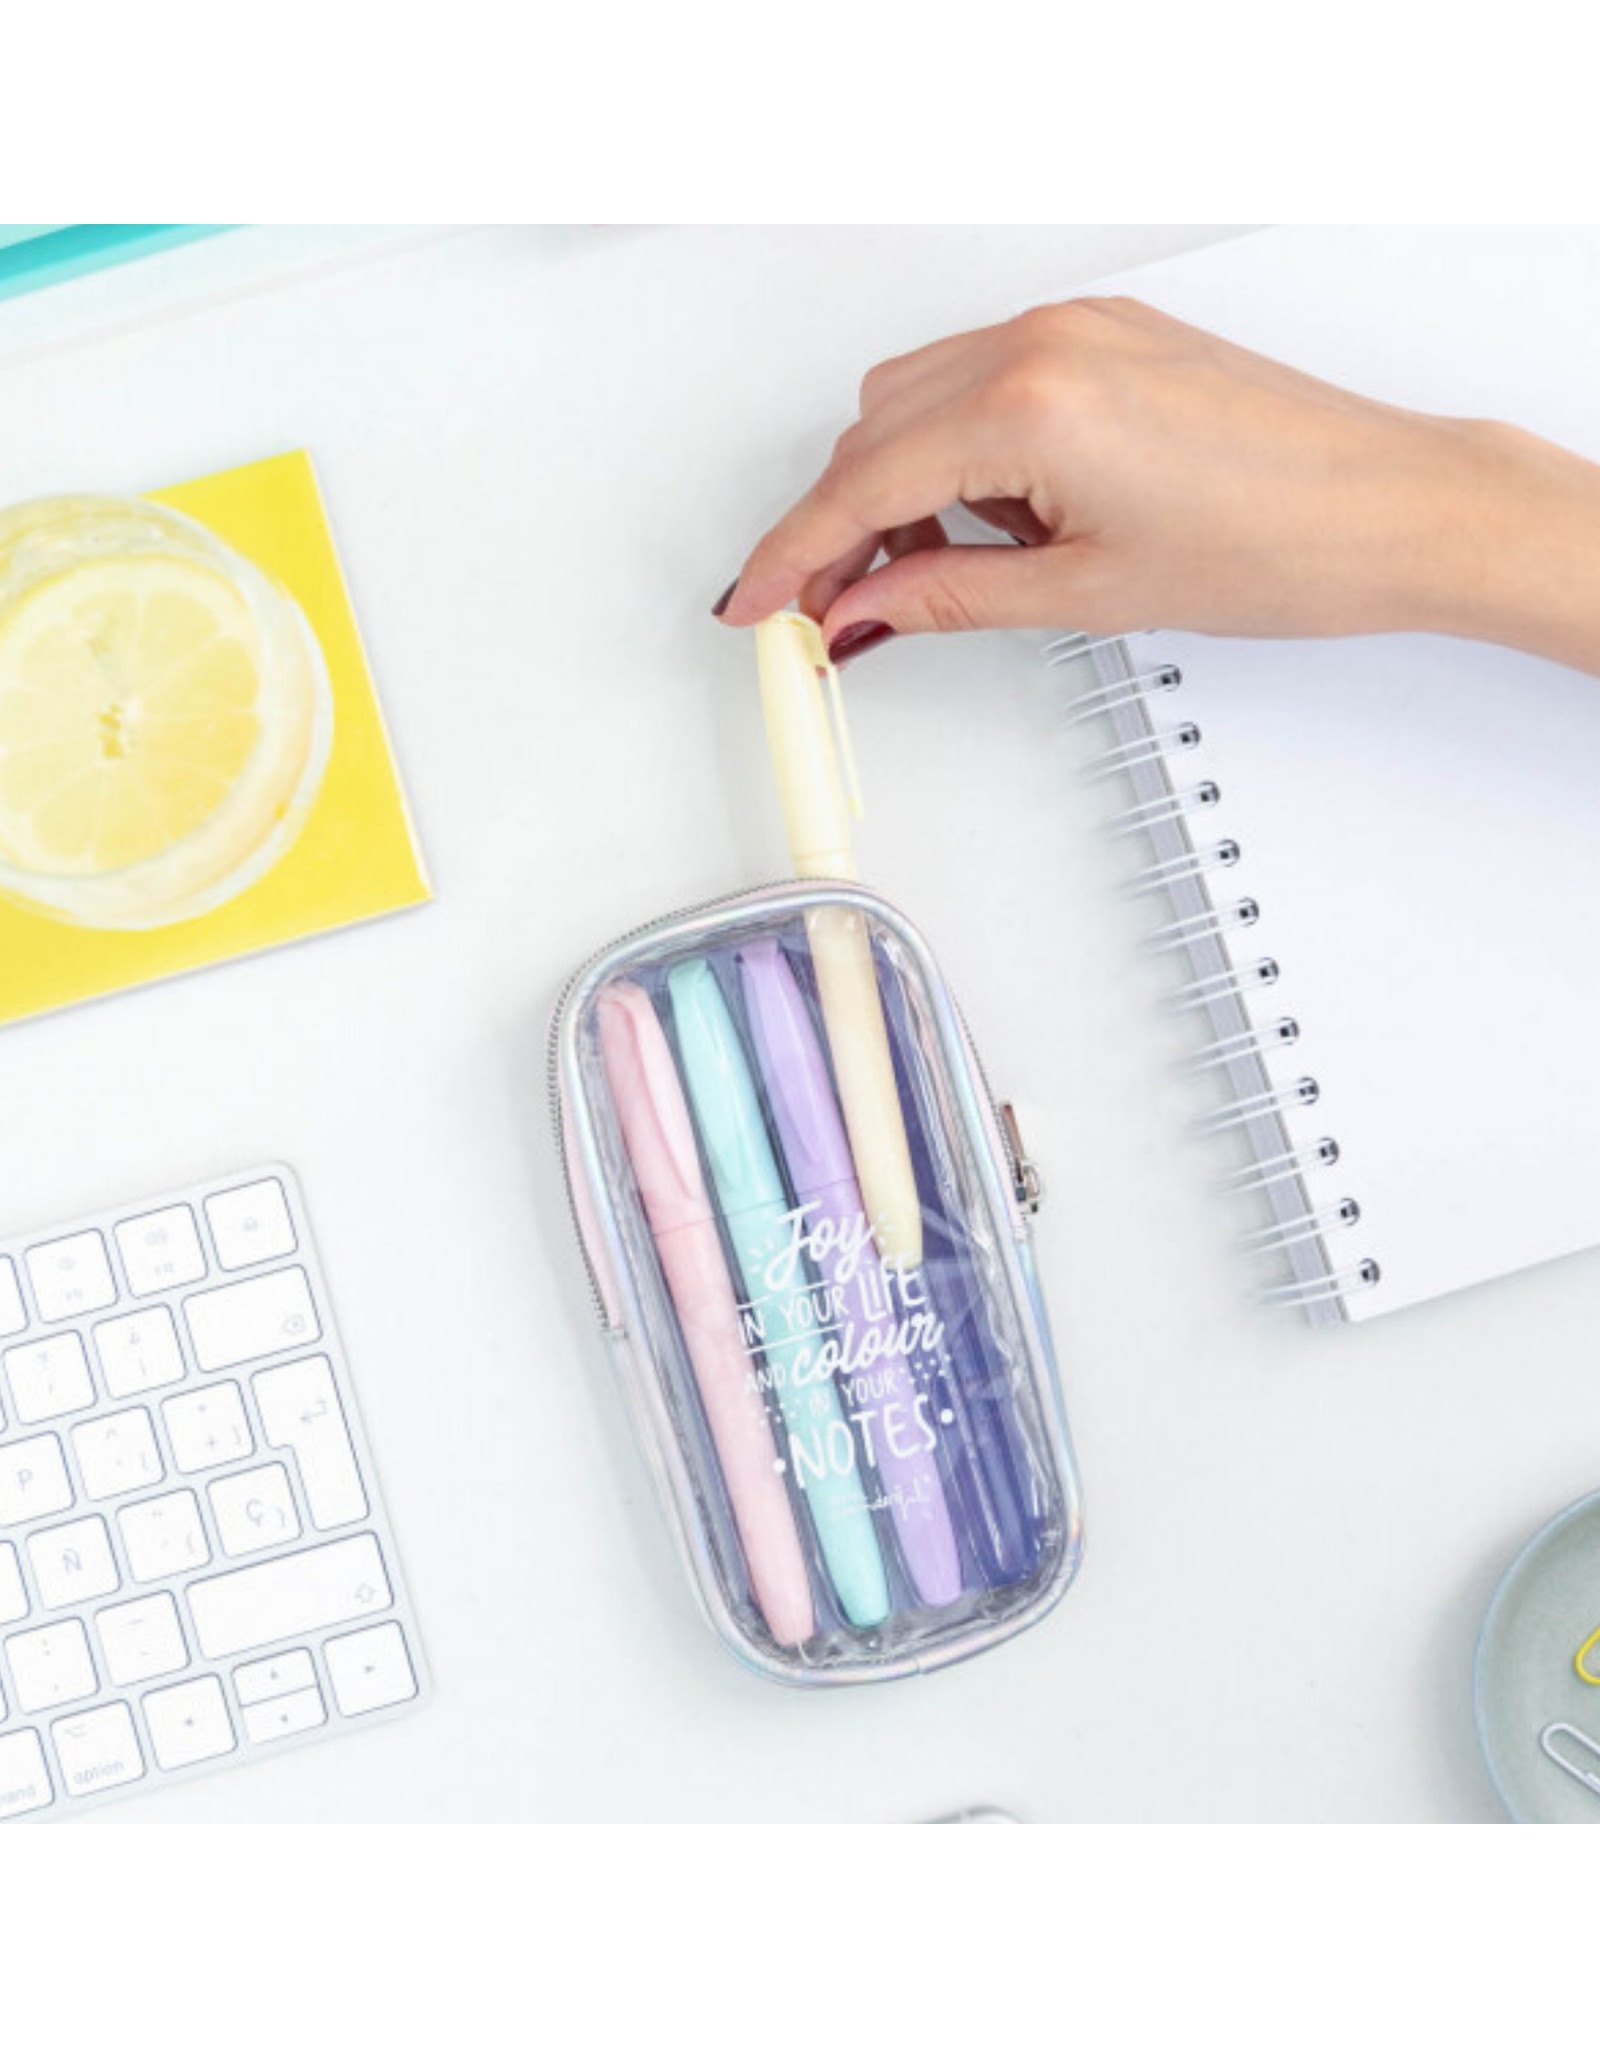 Mr Wonderful Highlighter set to Make your Notes shine even Brighter